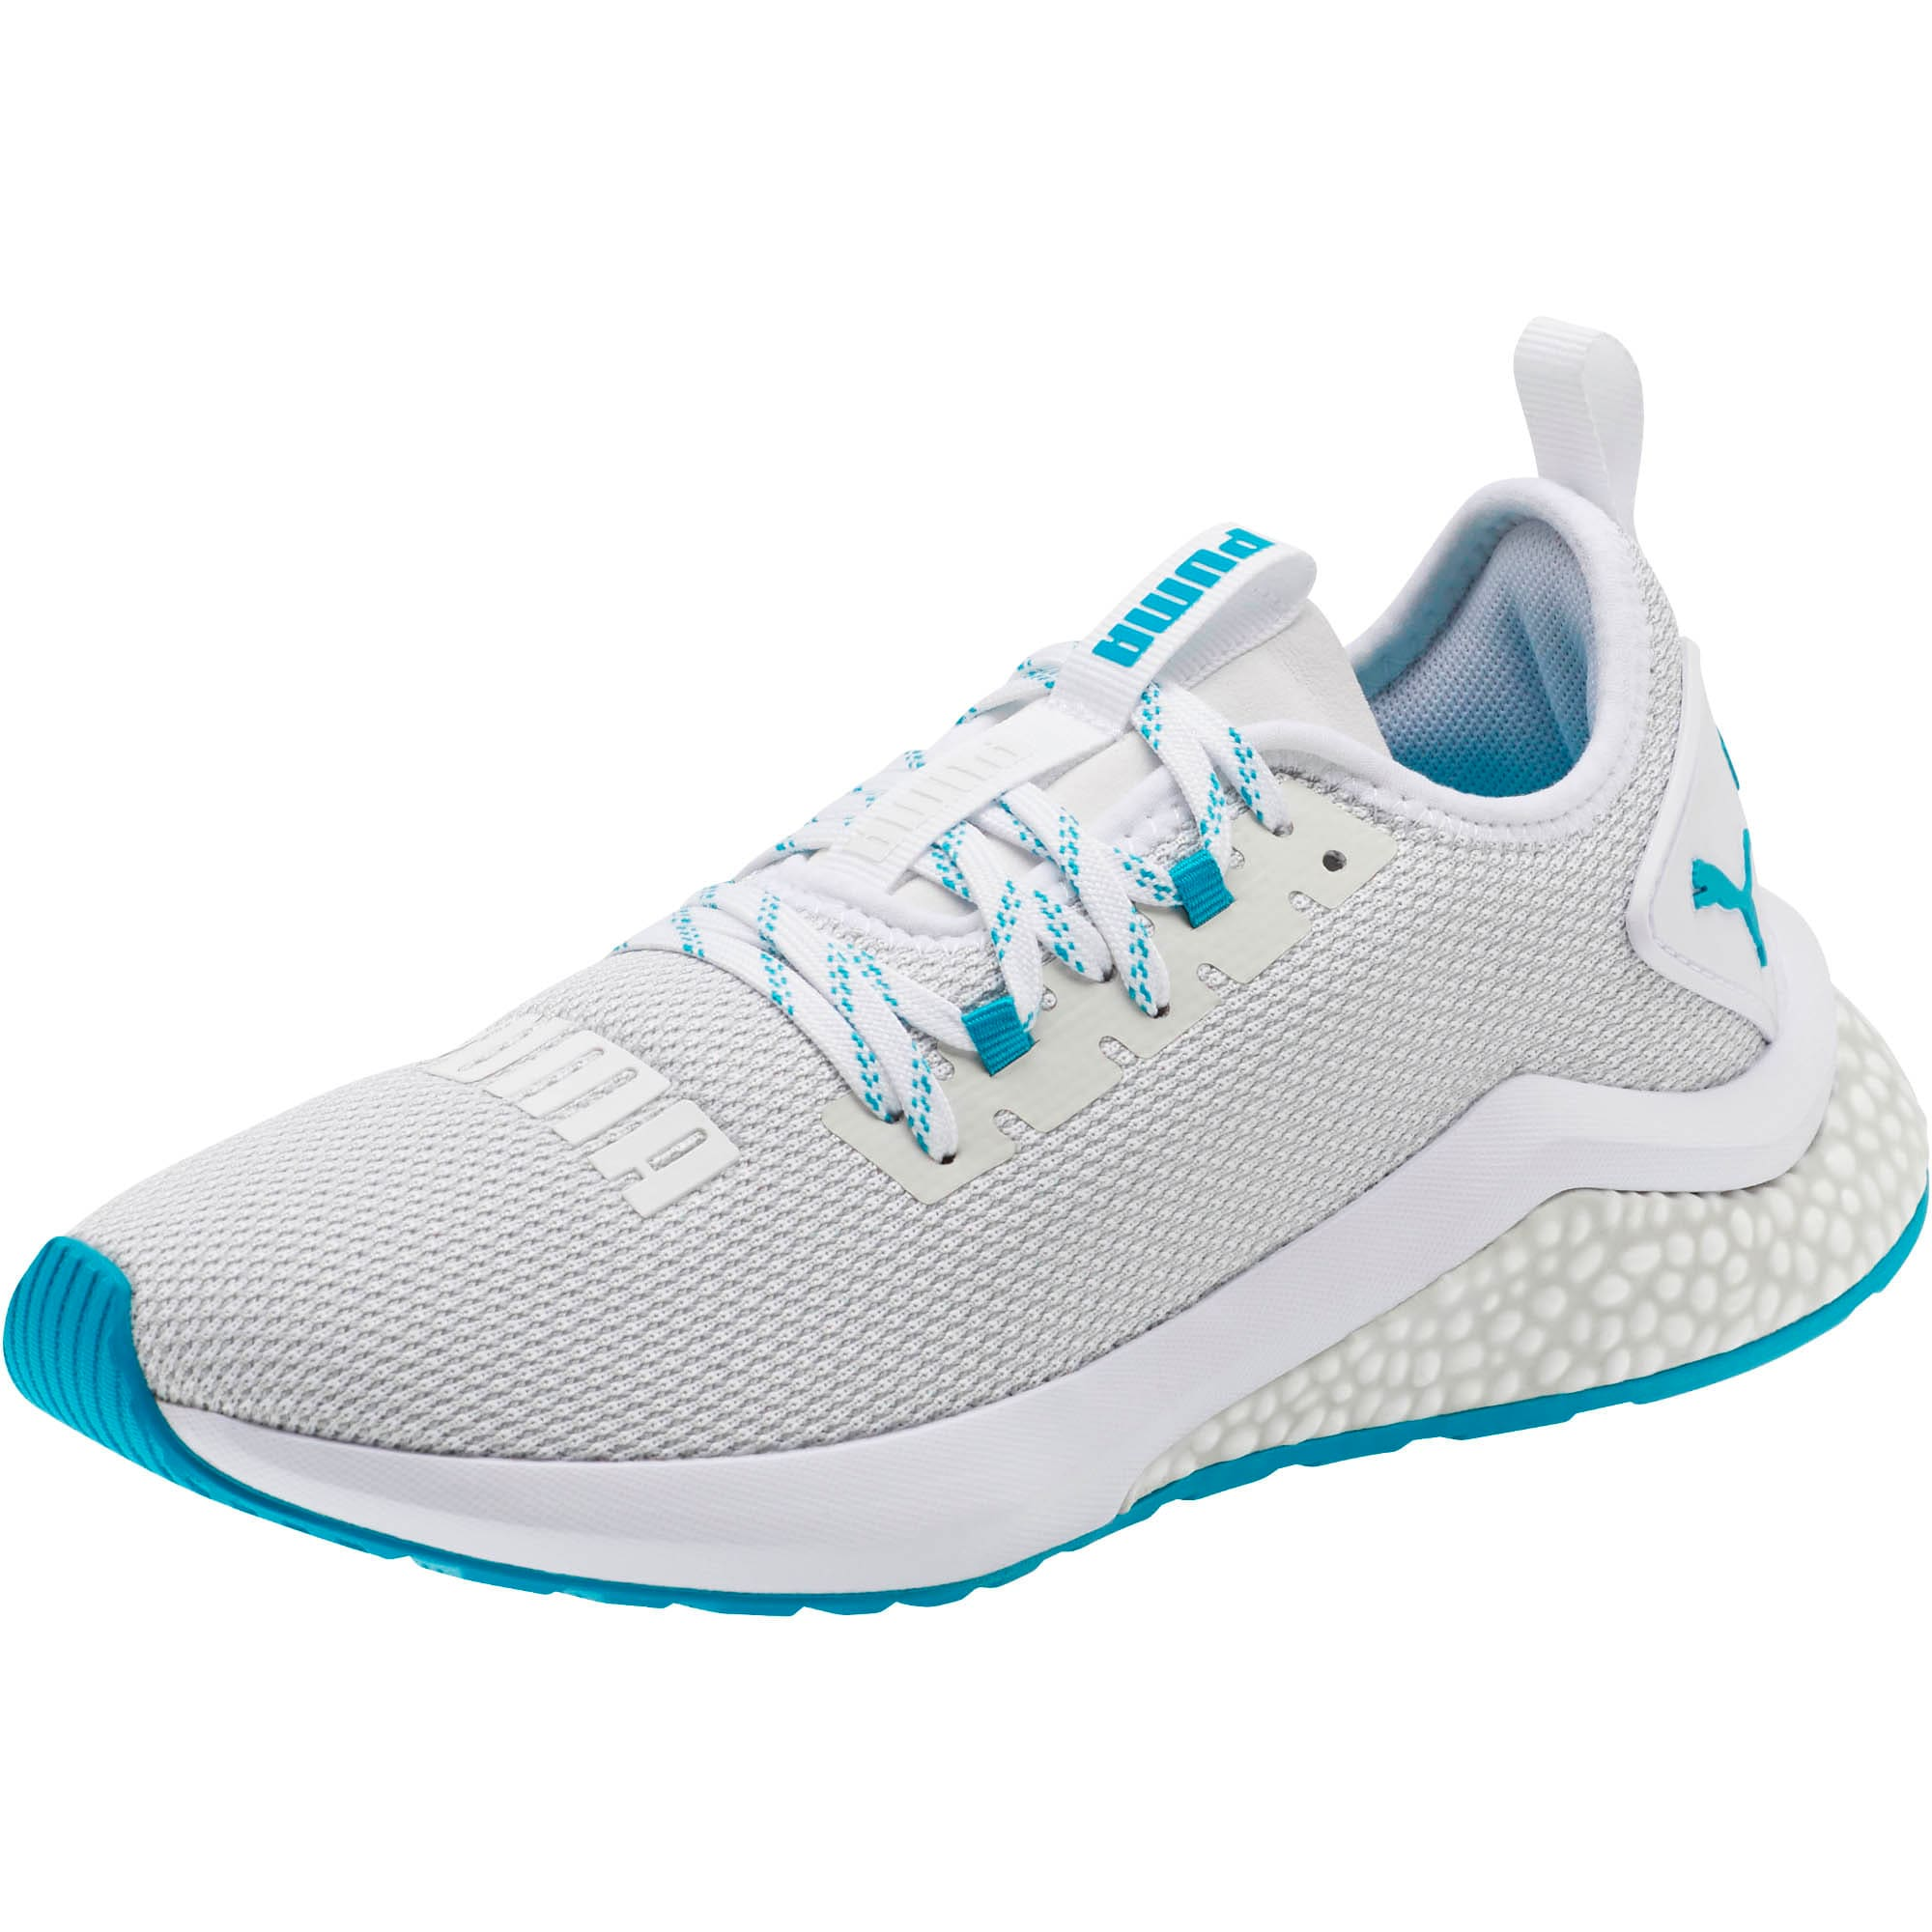 Thumbnail 1 of HYBRID NX Women's Running Shoes, Puma White-Caribbean Sea, medium